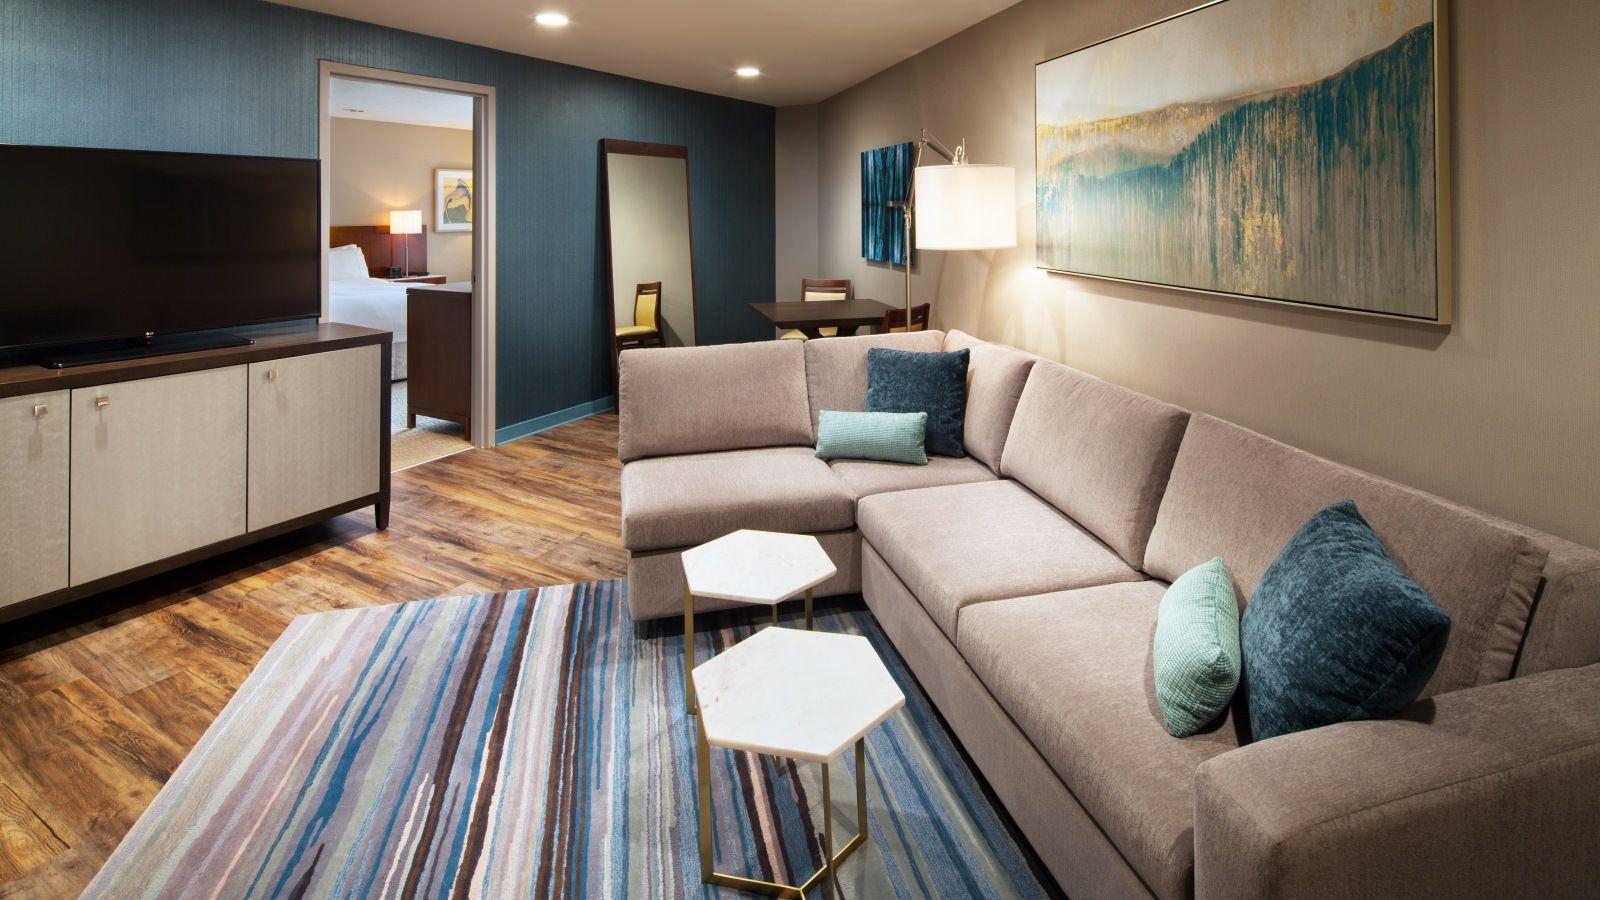 westin-sfo-suite-living-room-1600x900.jpg